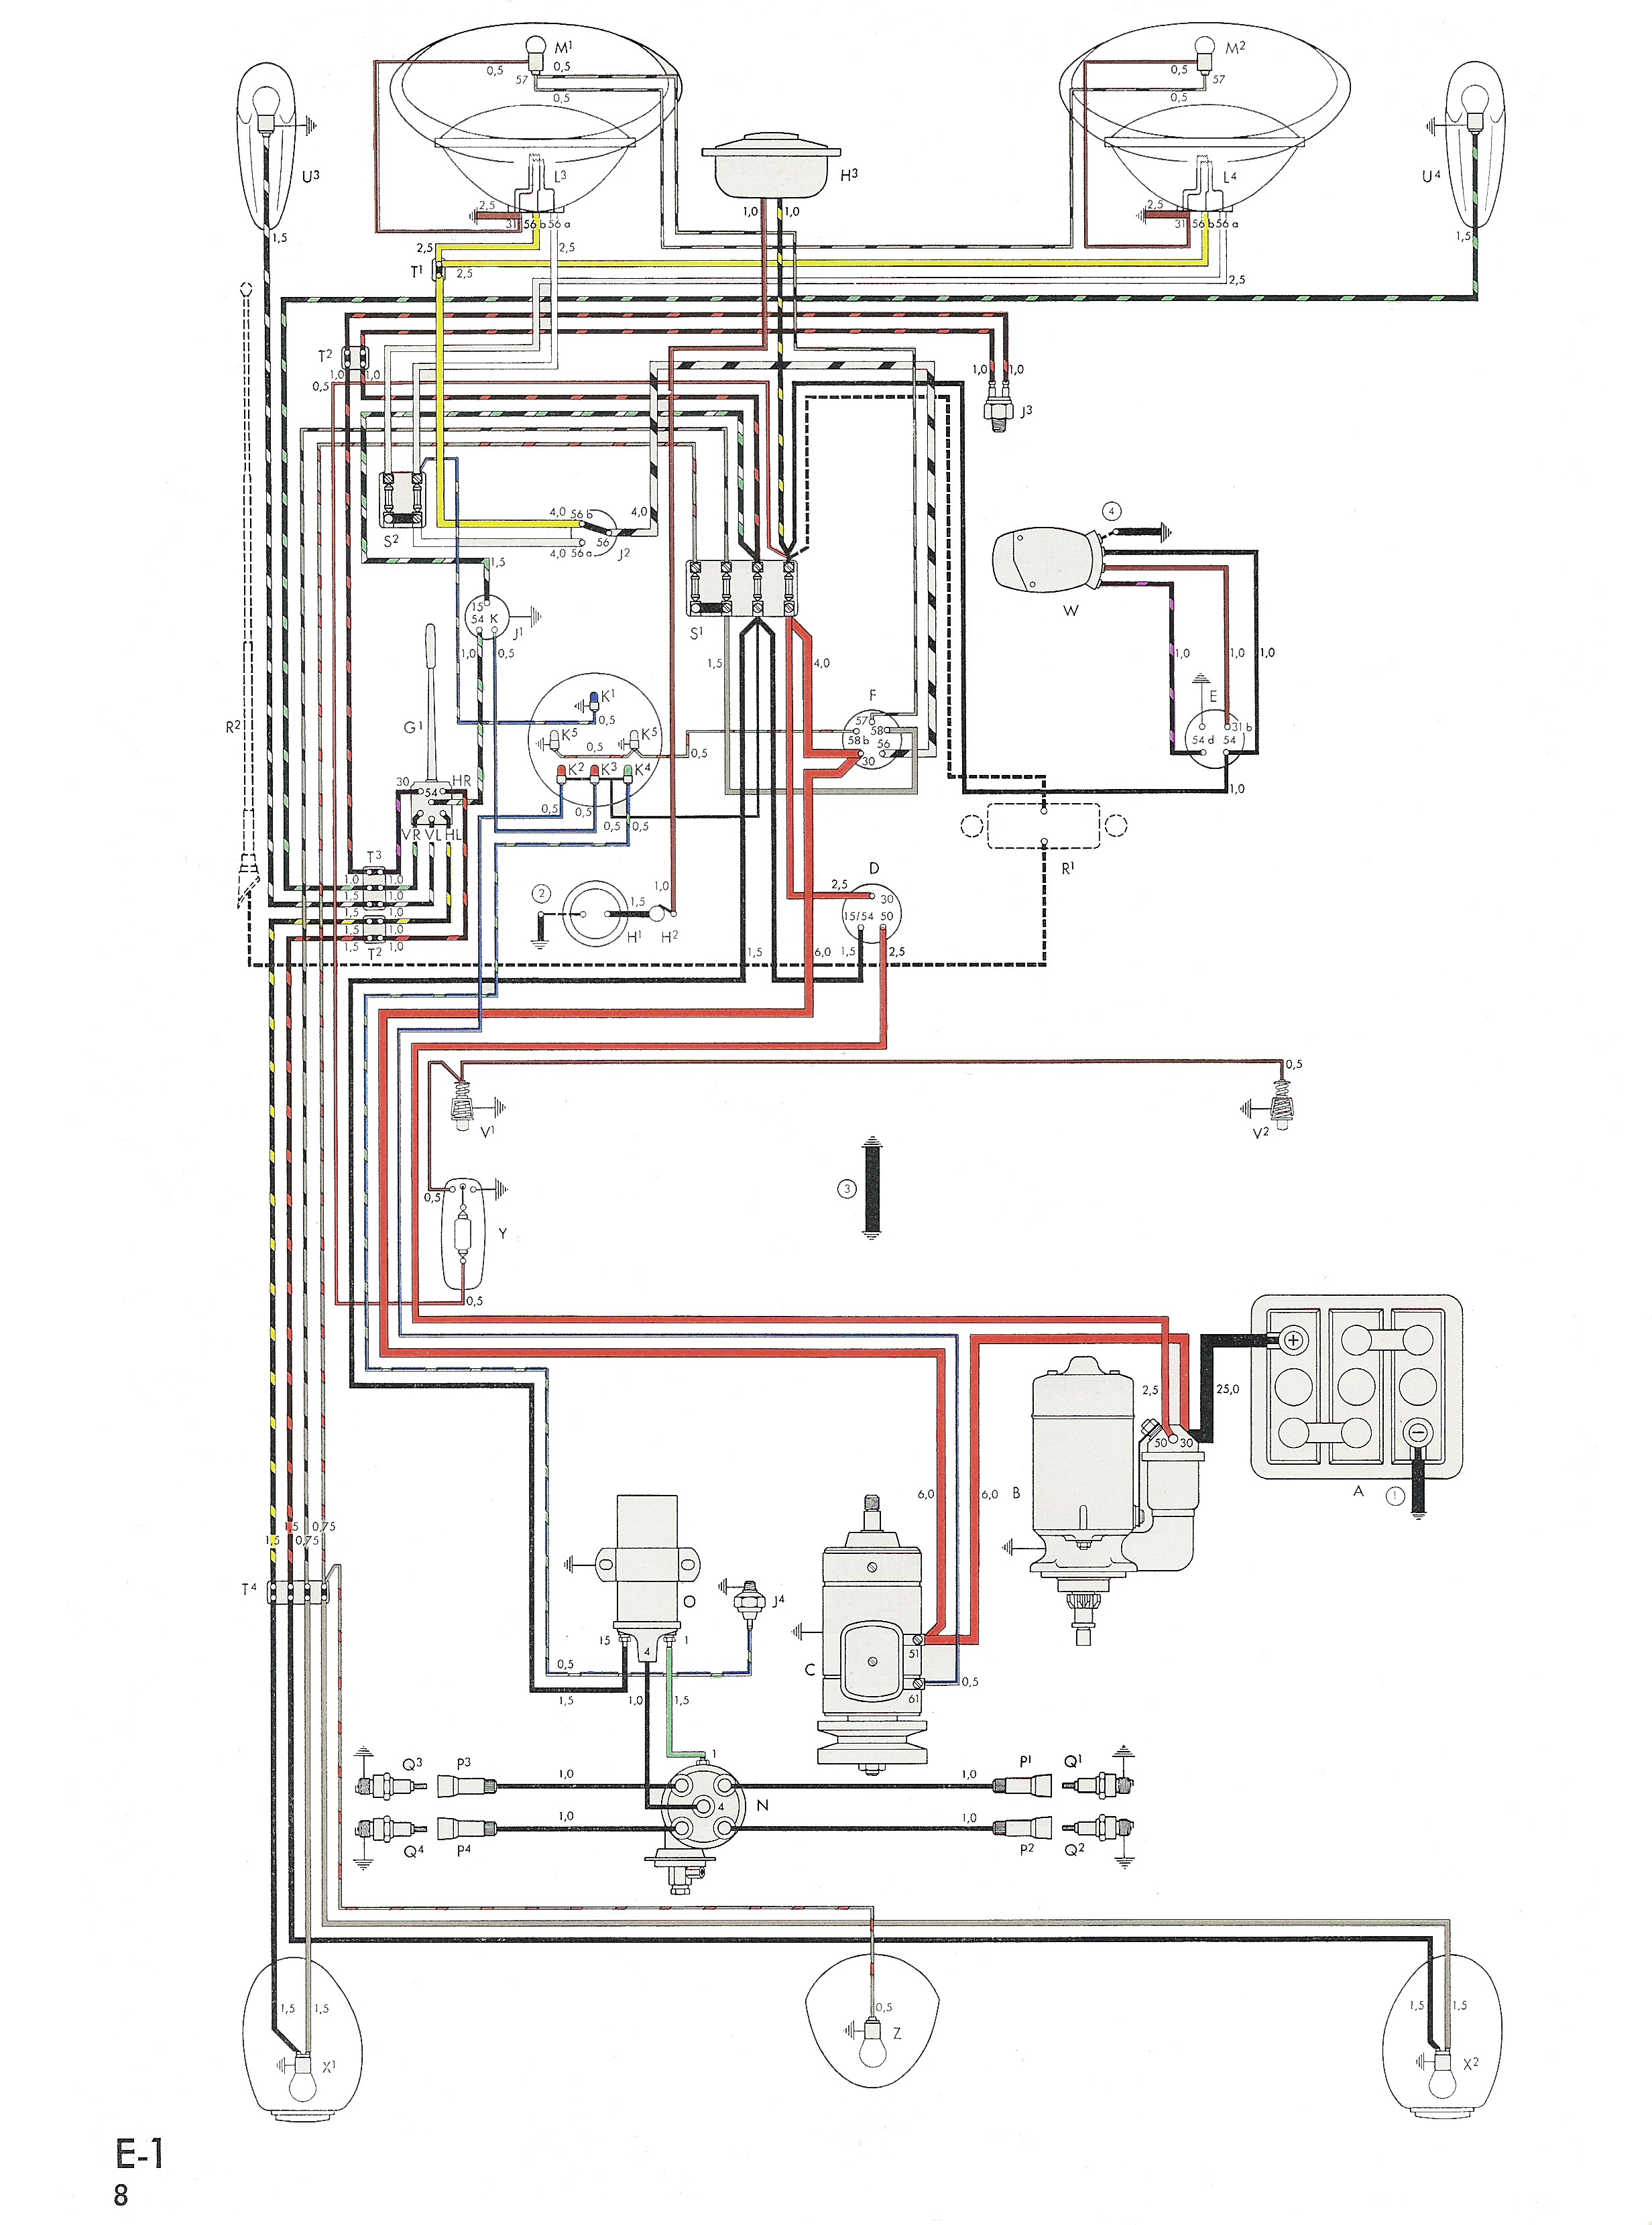 2000 Vw Beetle Alternator Wiring Harness : Vw beetle parts diagram fuse box